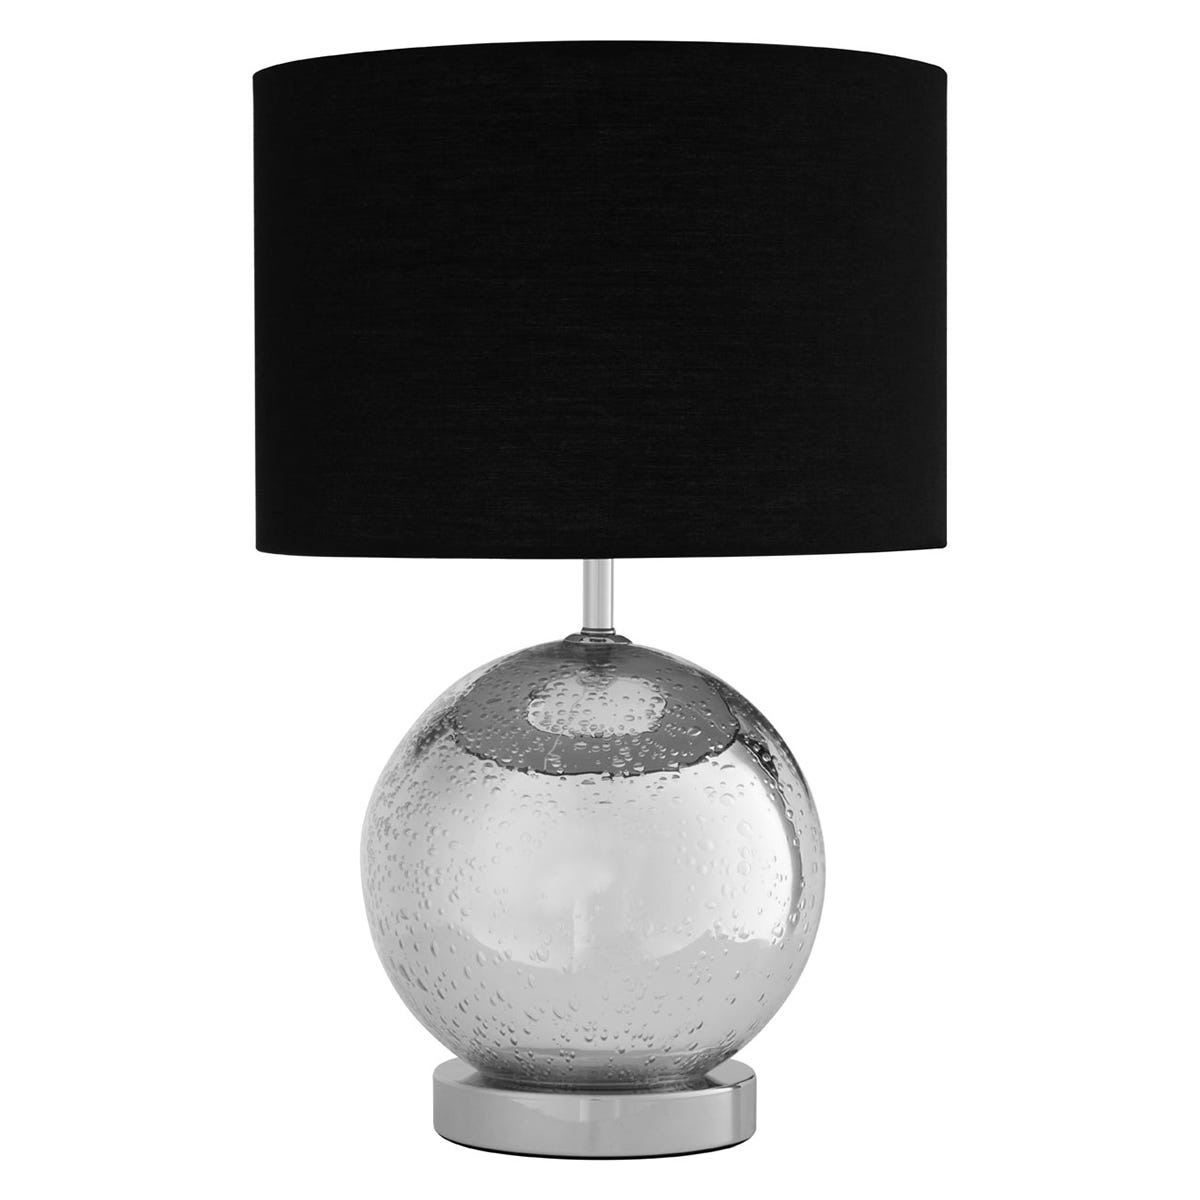 Premier Housewares Naomi Table Lamp with Chrome Glass Base & Black Fabric Shade